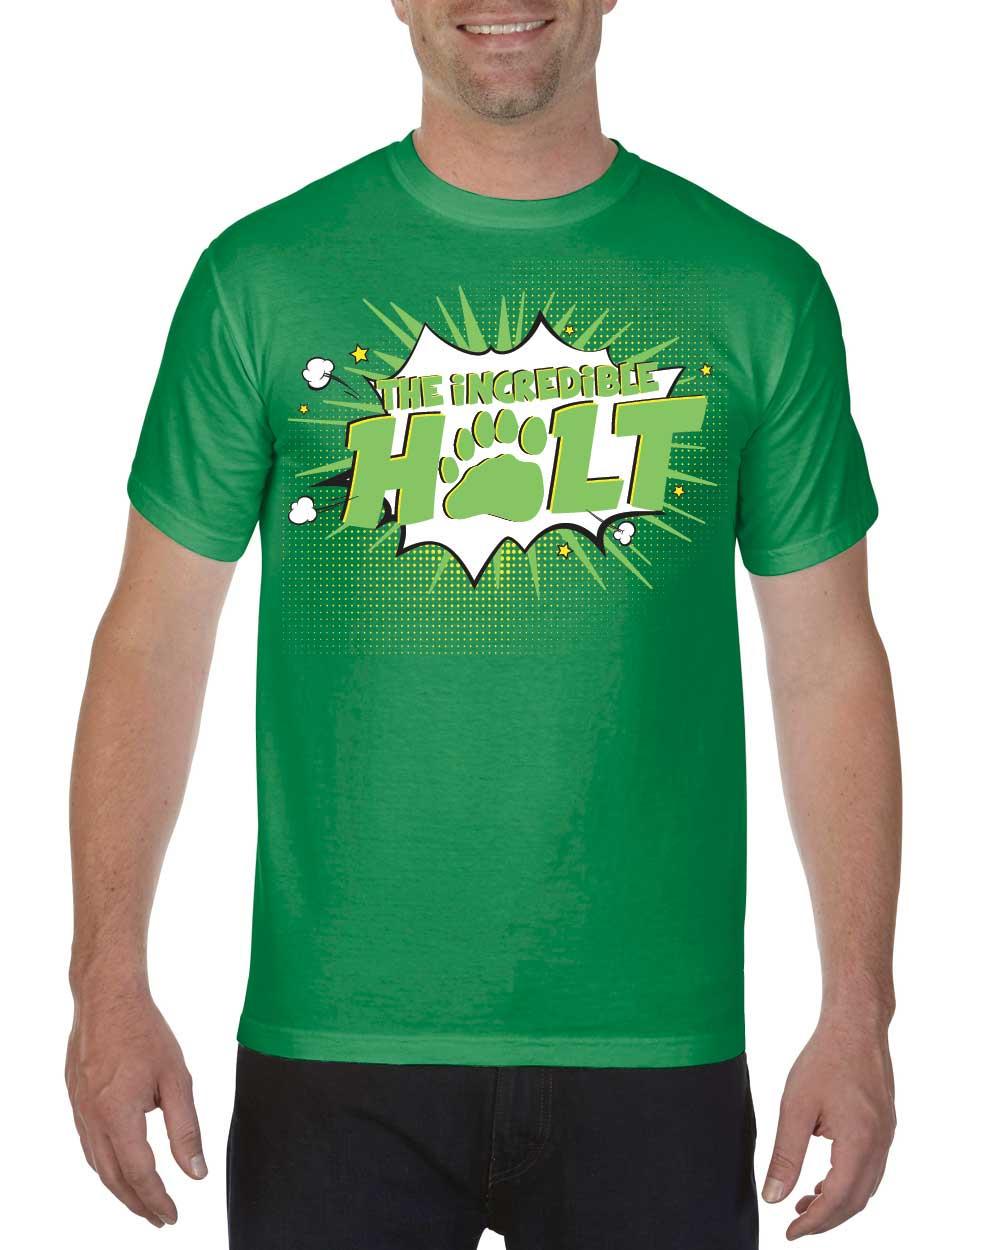 GDBA 2018 T-Shirt Design